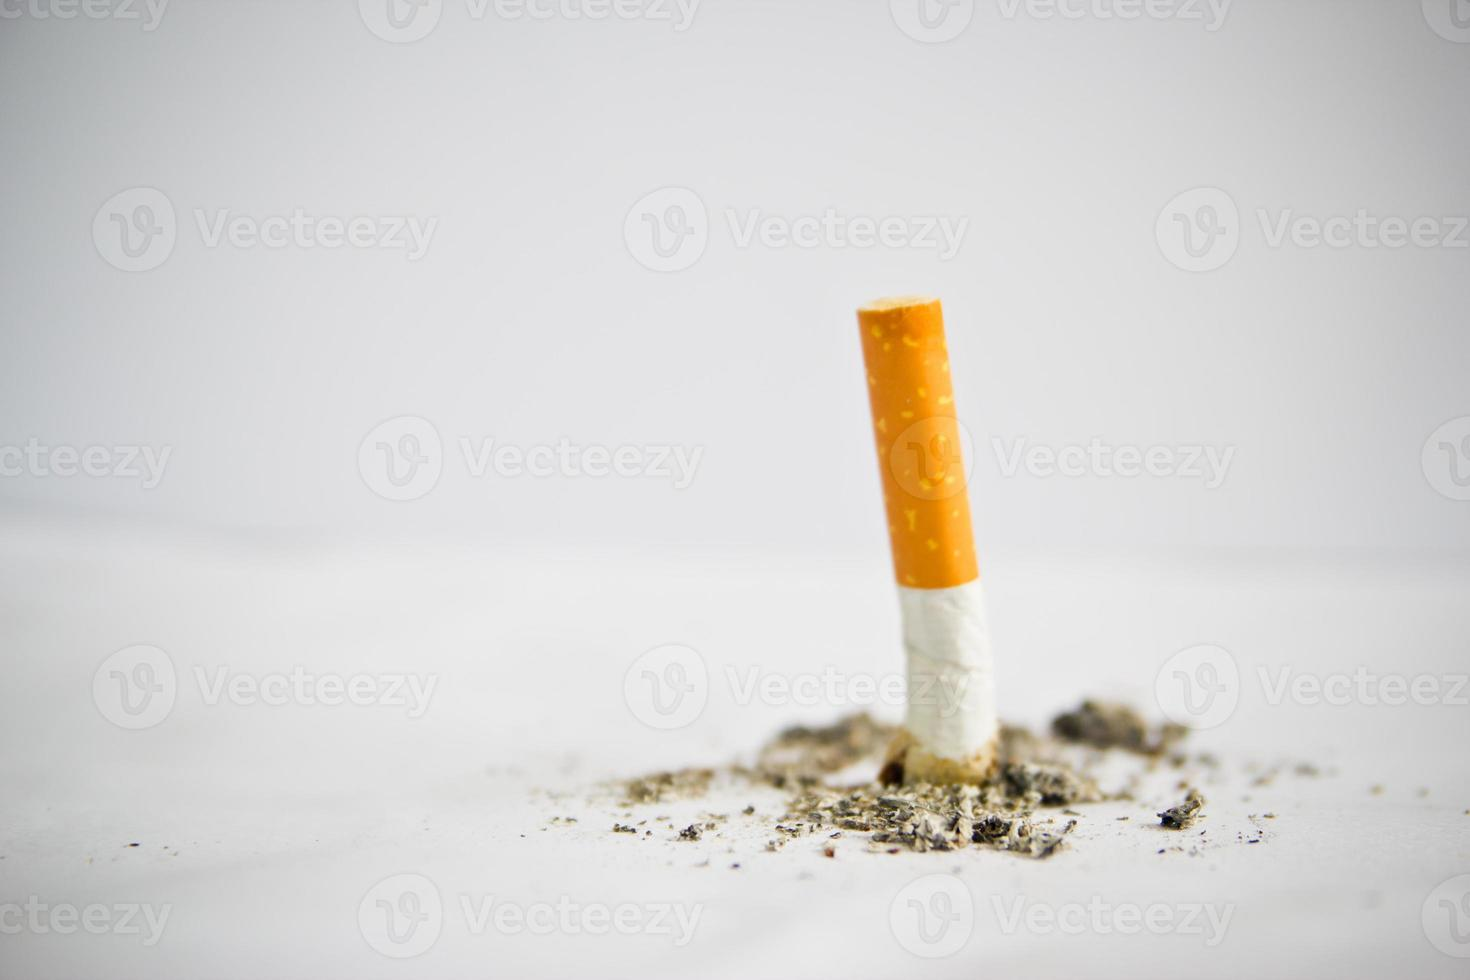 verbruikte sigaretten op witte achtergrond foto